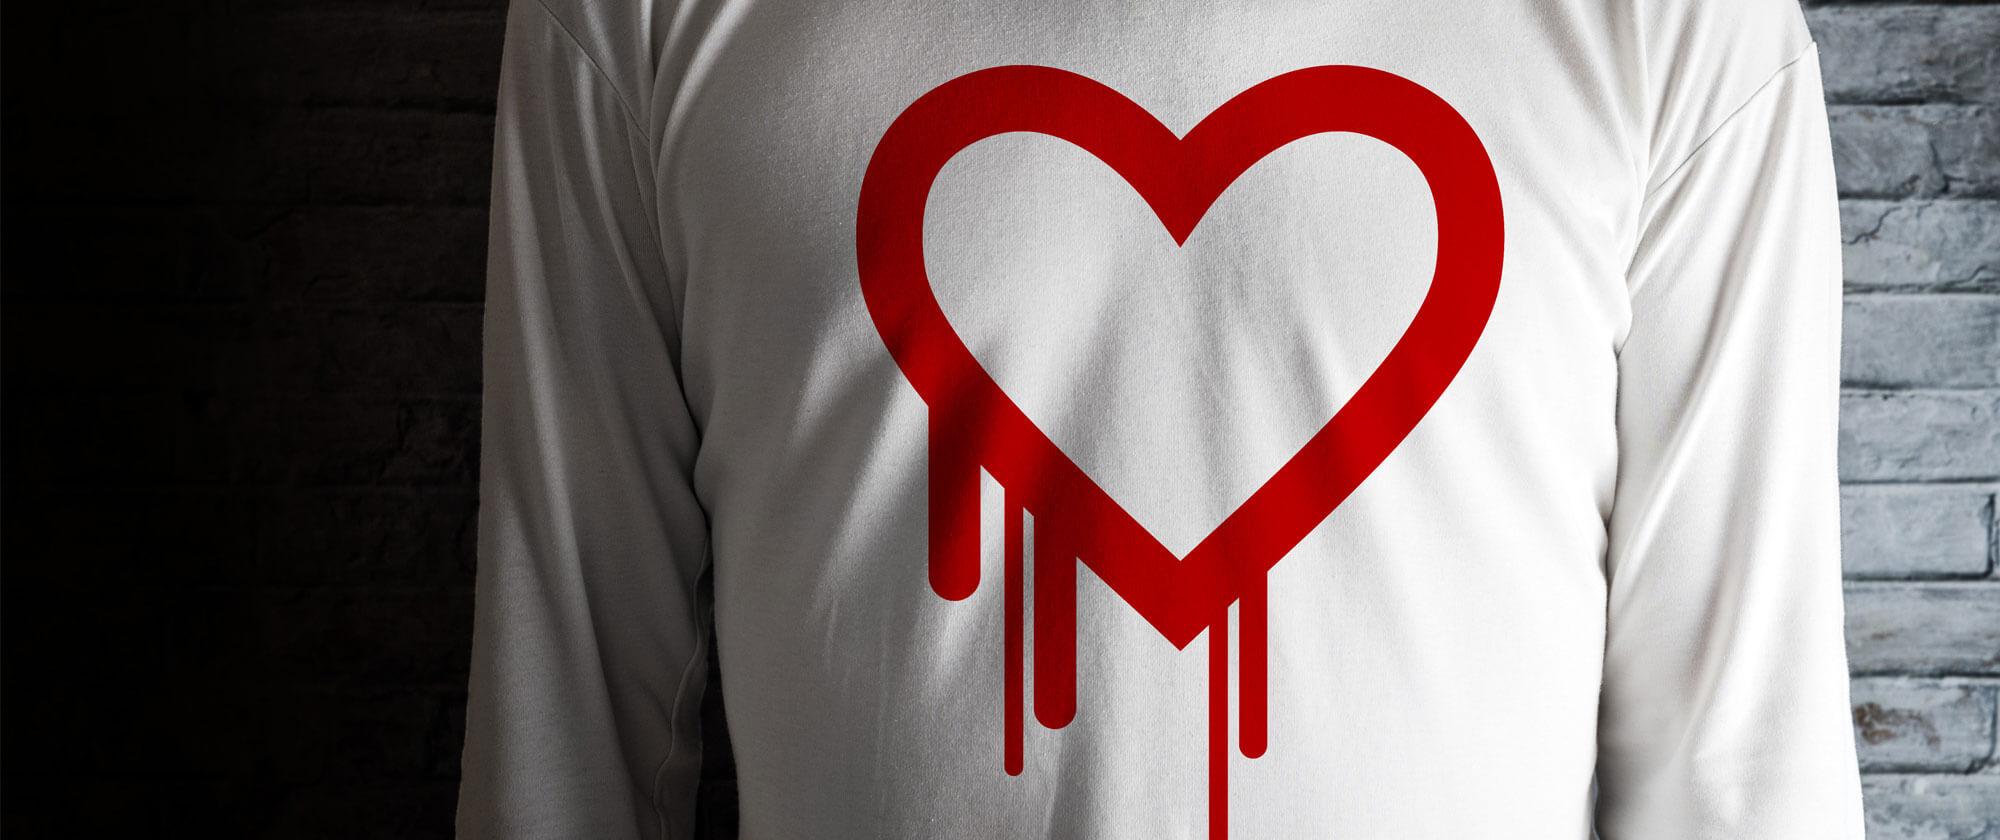 Genser med heartbleed-symbol